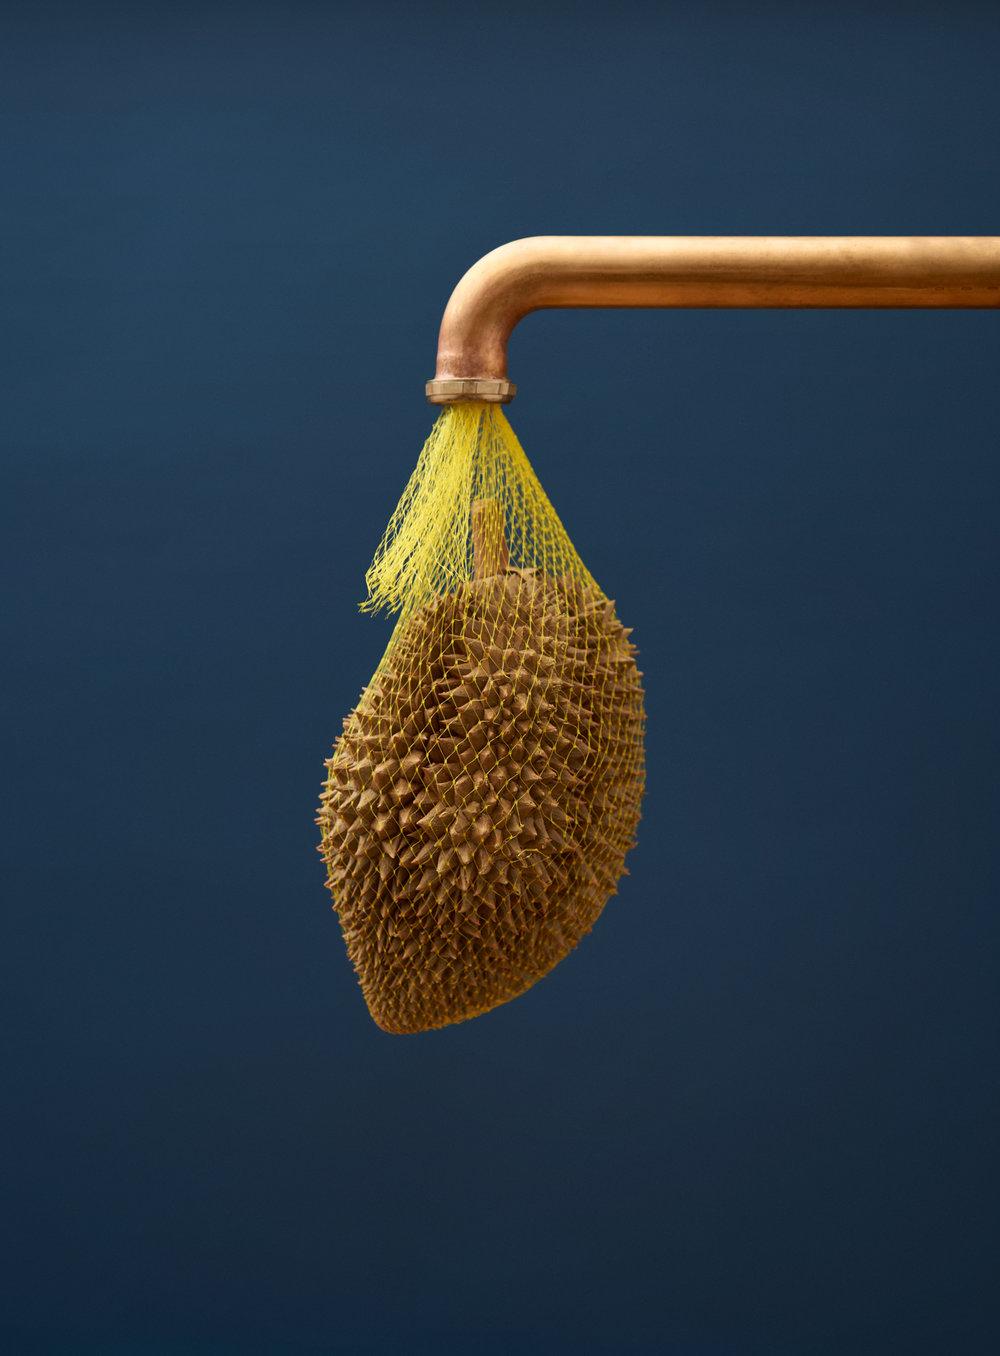 Copper-Pipe-Durian-Still-Life-Sentence.jpg